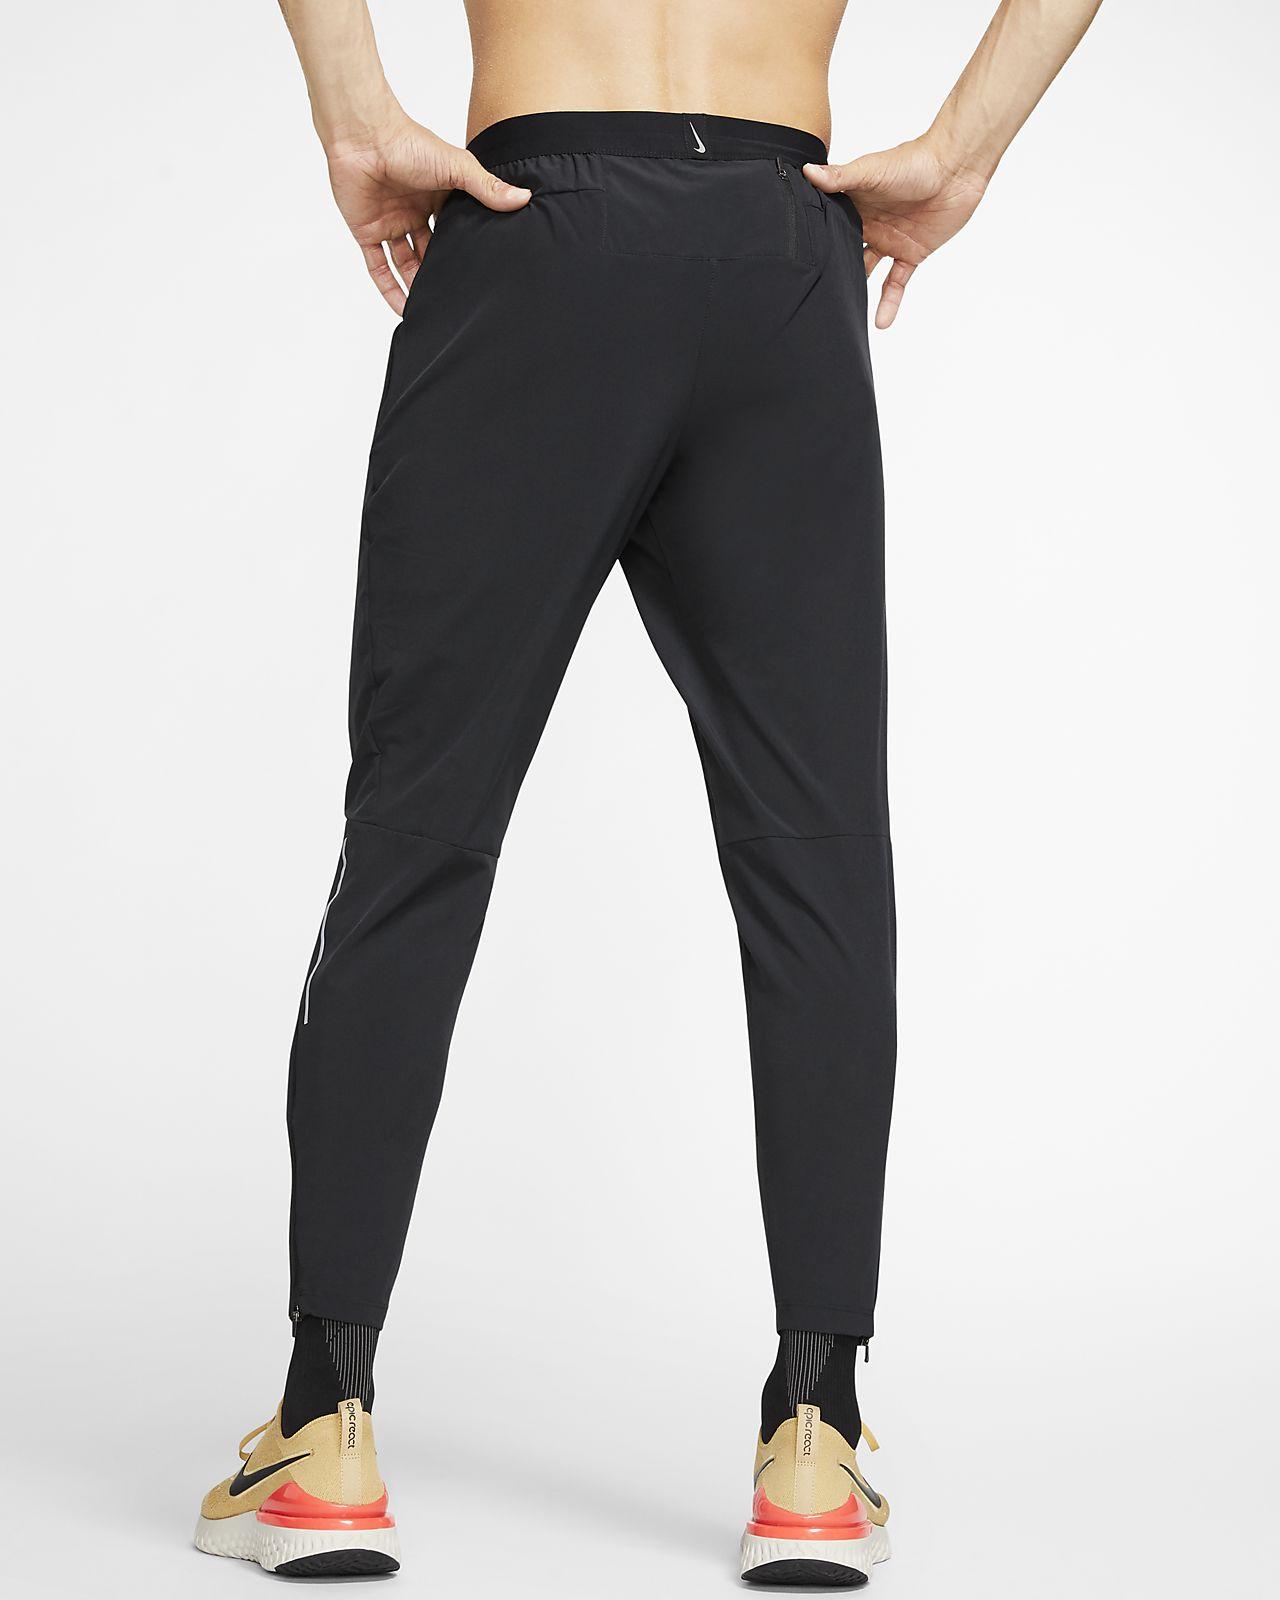 Pantalon de running Nike Phenom A.I.R. pour Homme. Nike FR